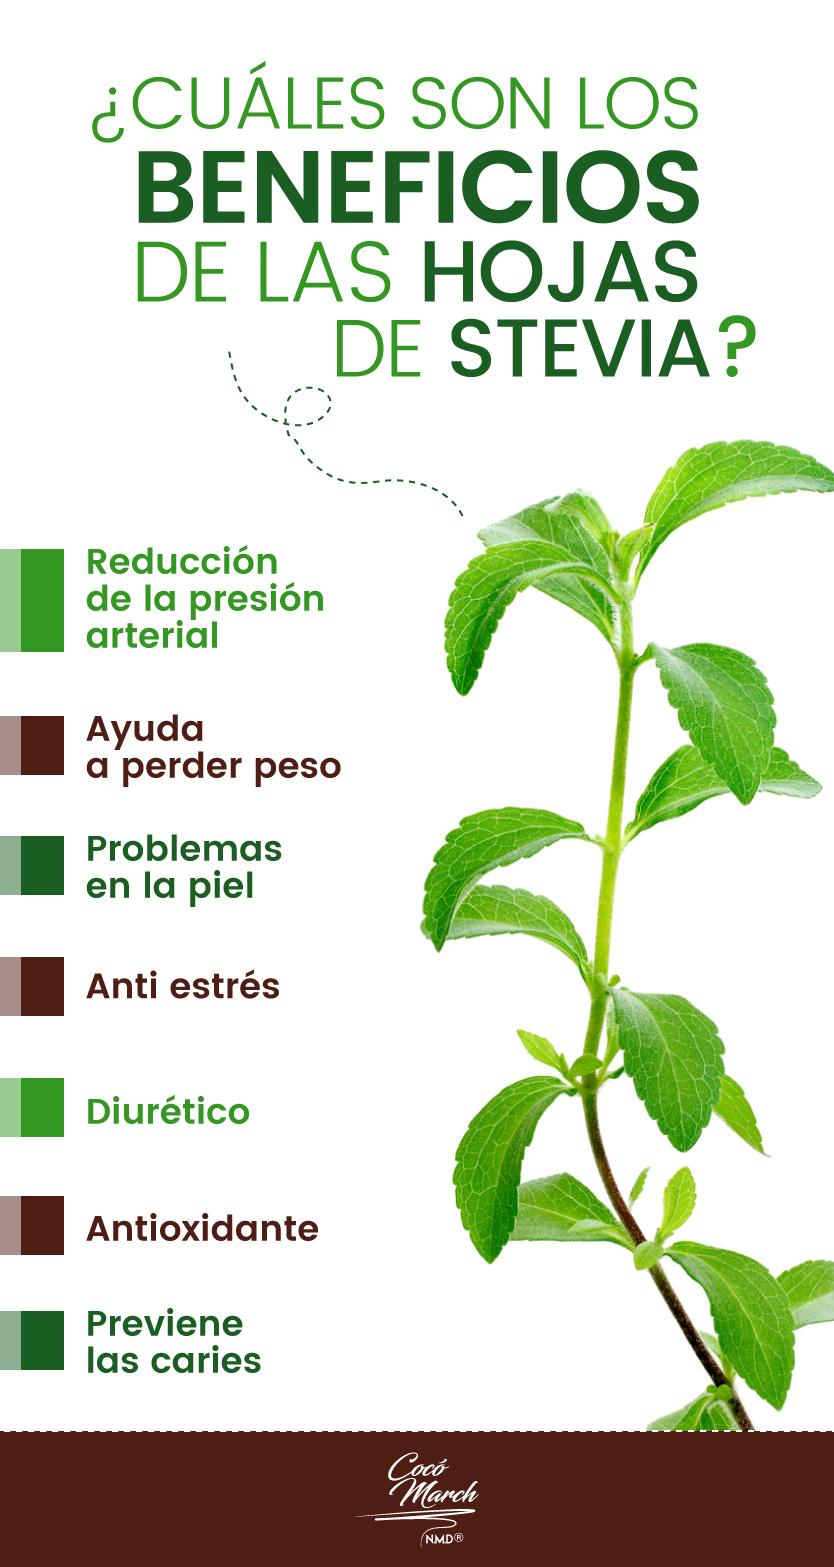 hojas-de-stevia-beneficios